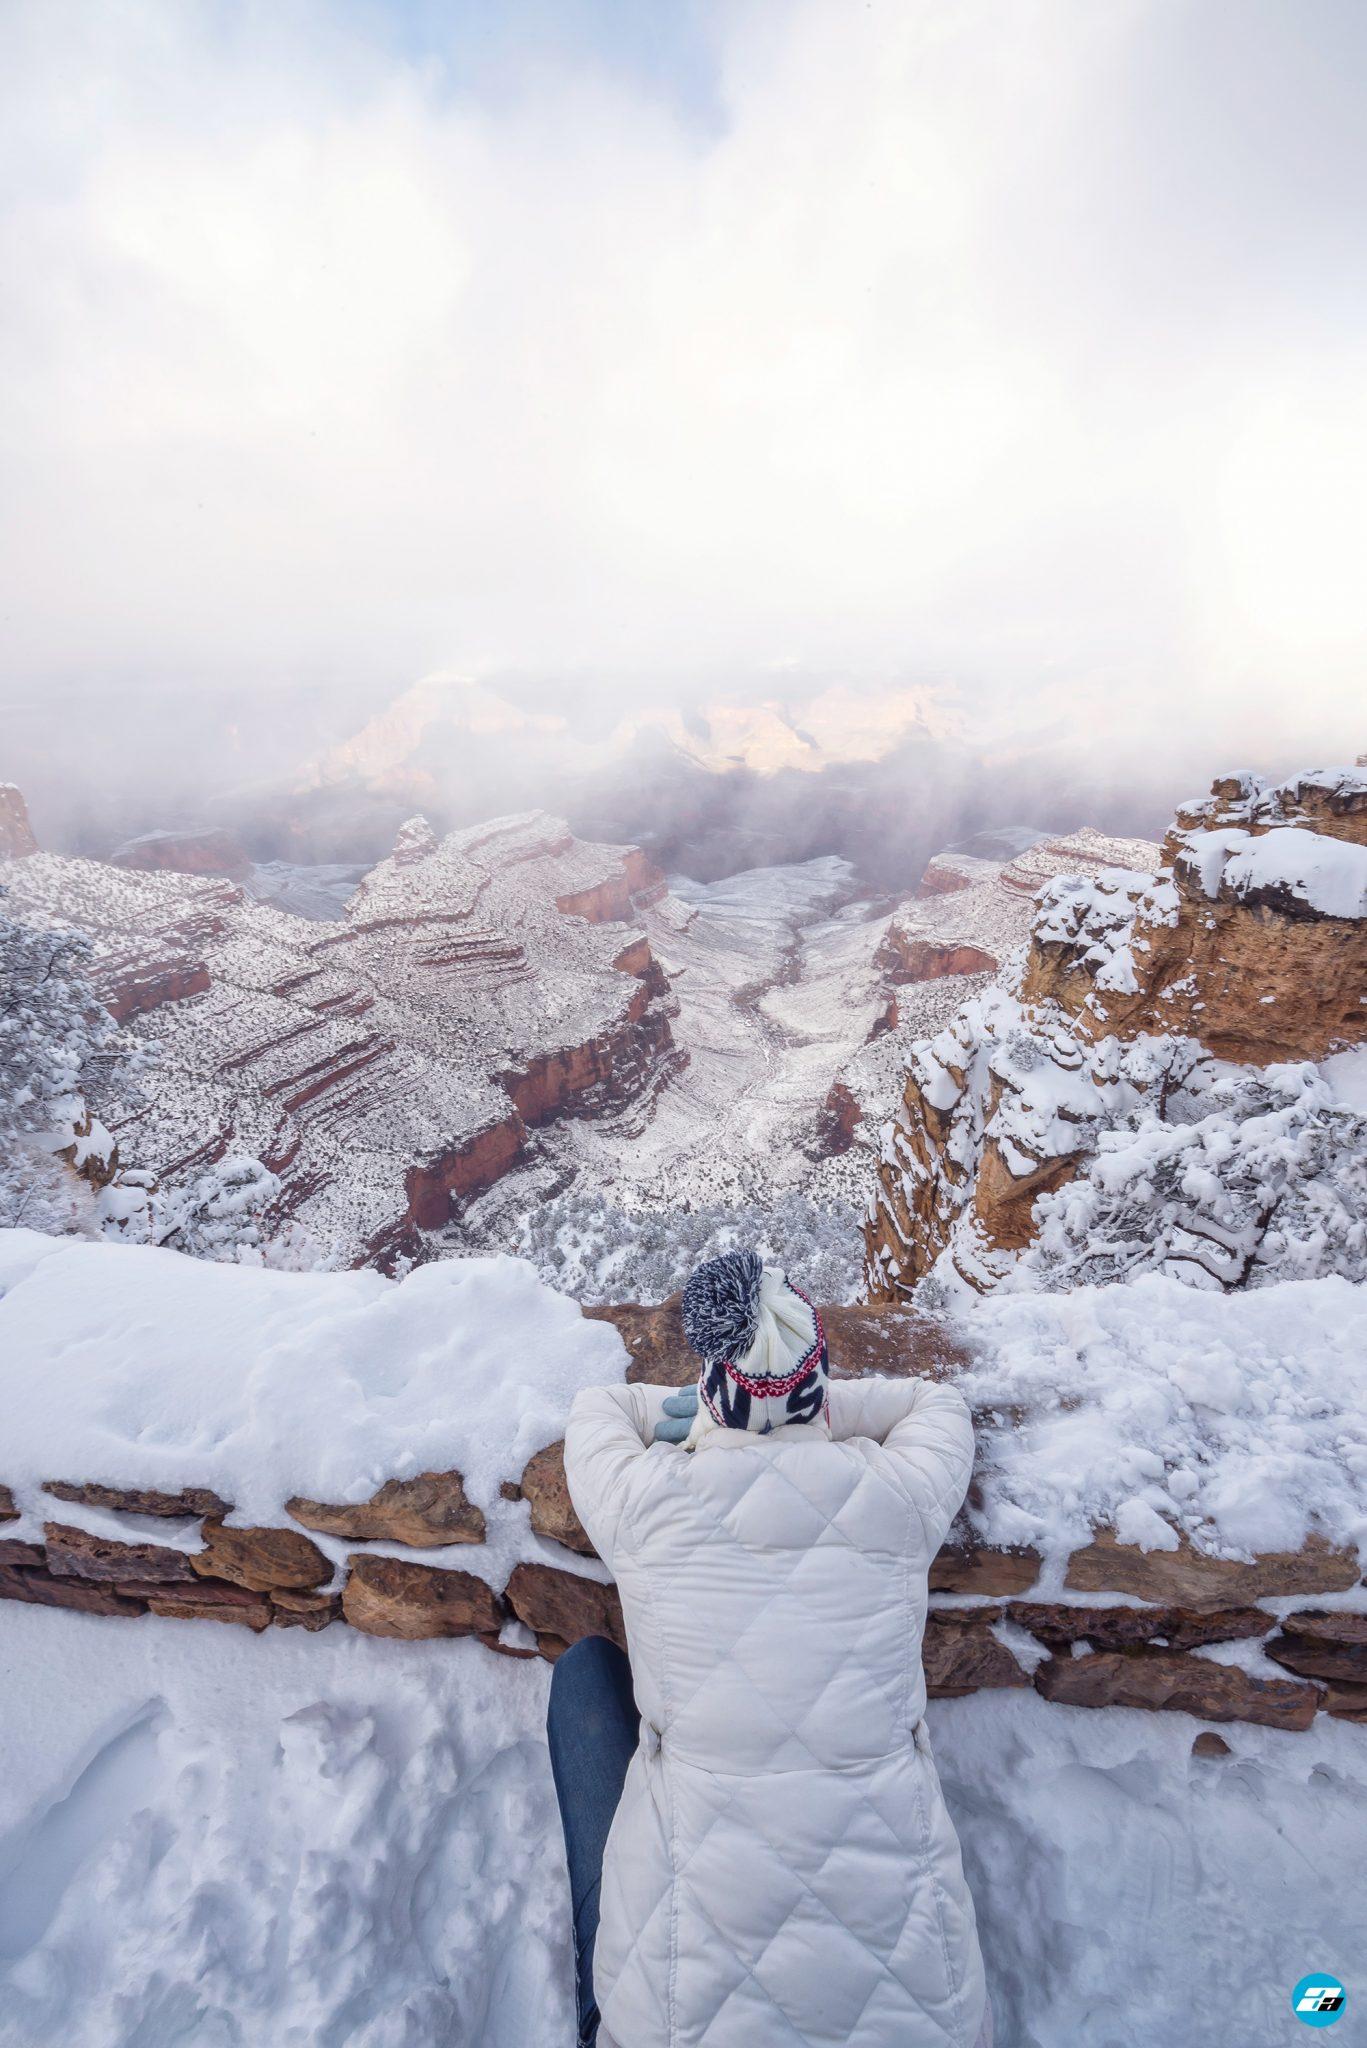 Grand Canyon National Park, Arizona, USA. Canyon View. Explorer. Winter Season. Arizona Attraction & Travel. Canyon Snow.